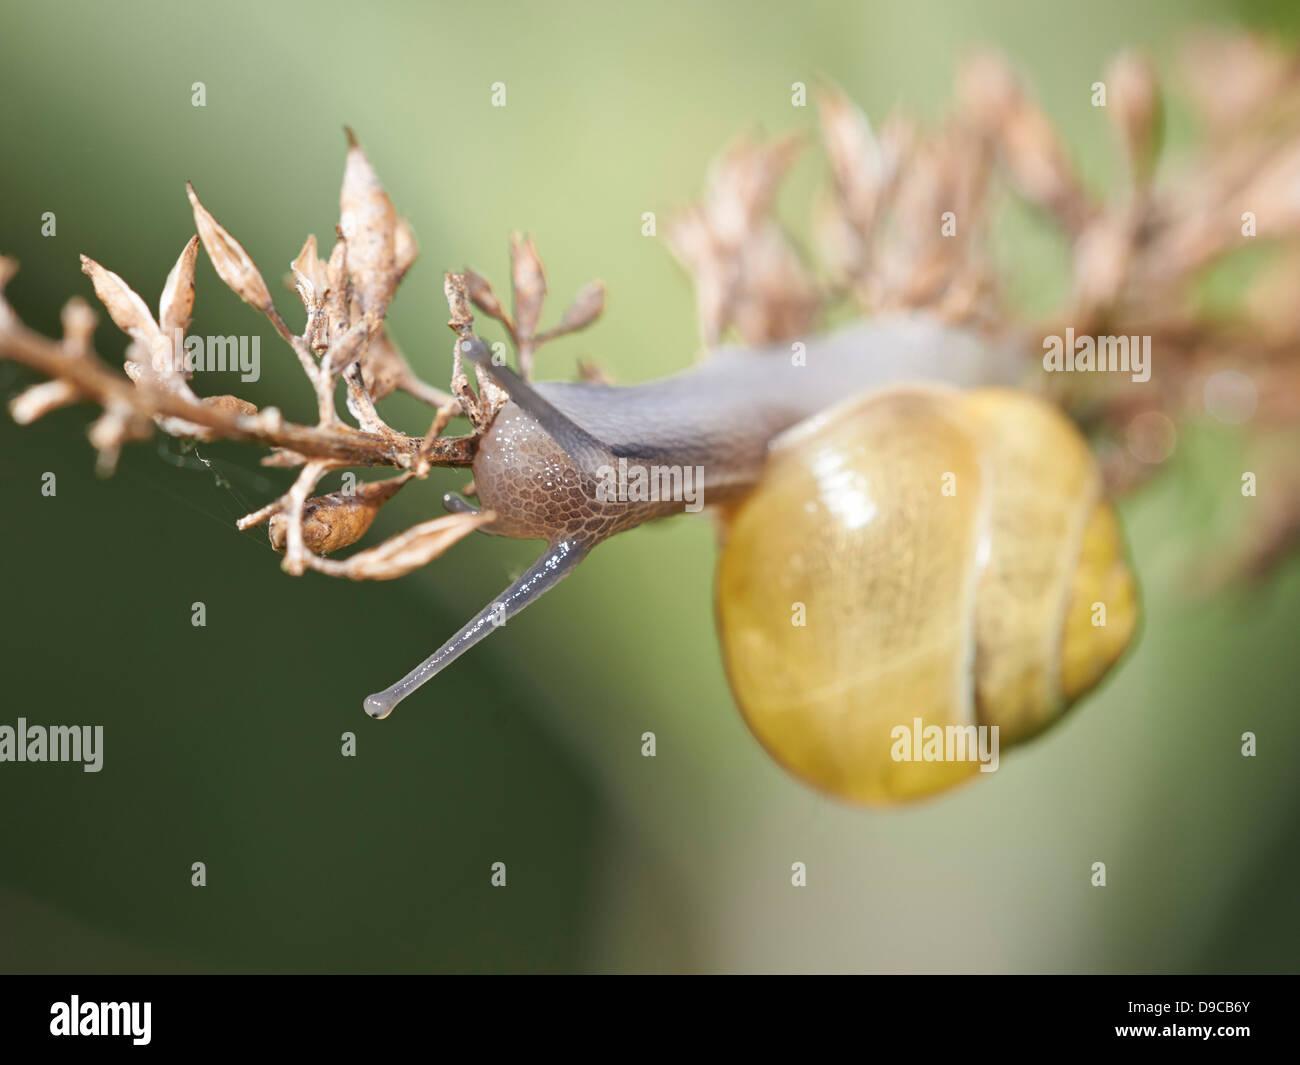 Garden Snail crawling along twig - Stock Image